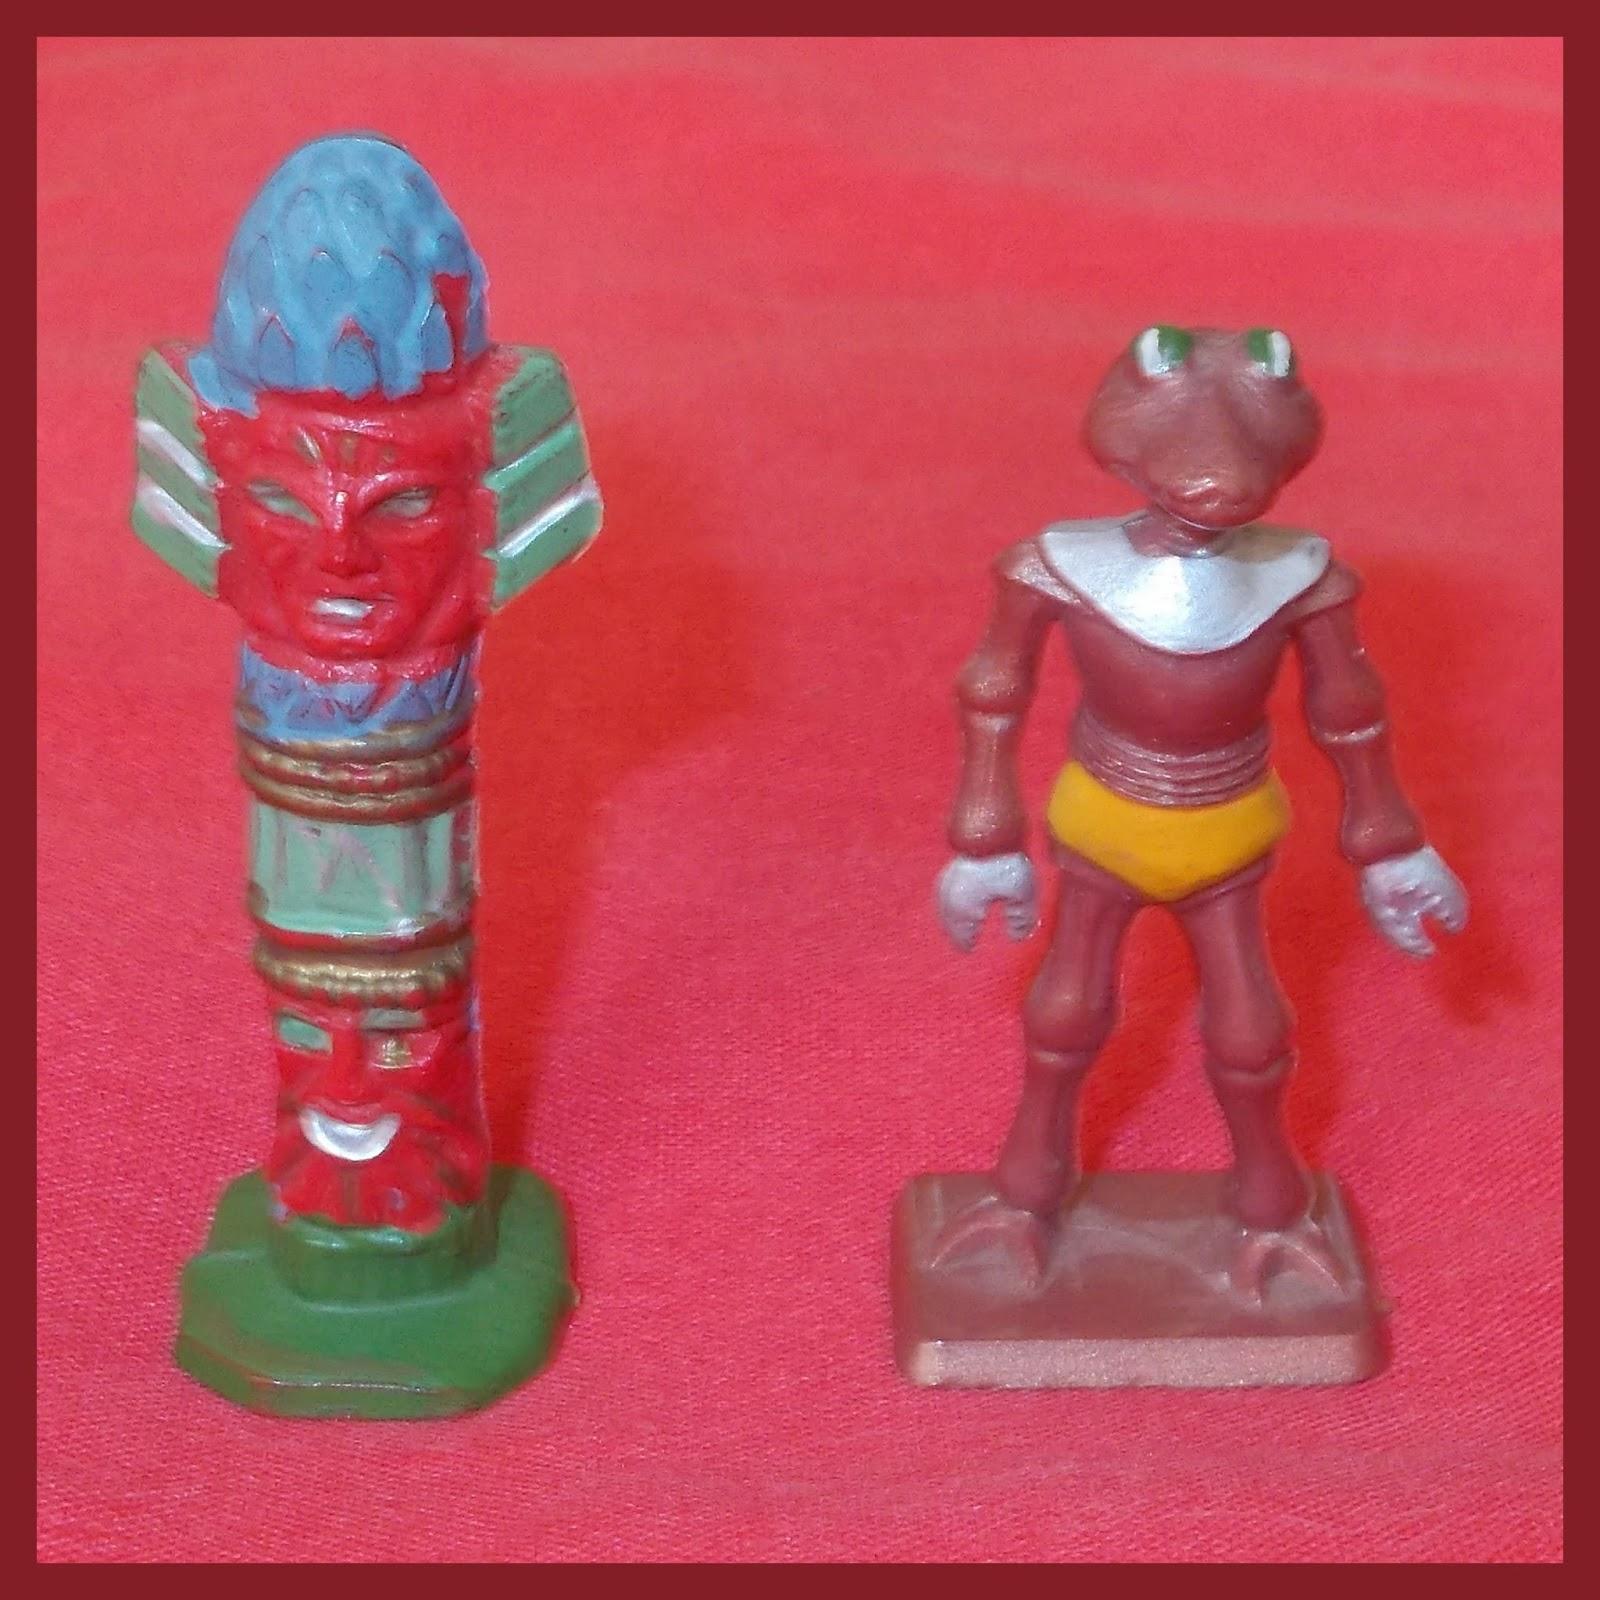 Mini Jumbo Italienische Bootleg Baravelli Getter Robo Online Discount Other Vintage Robot Toys